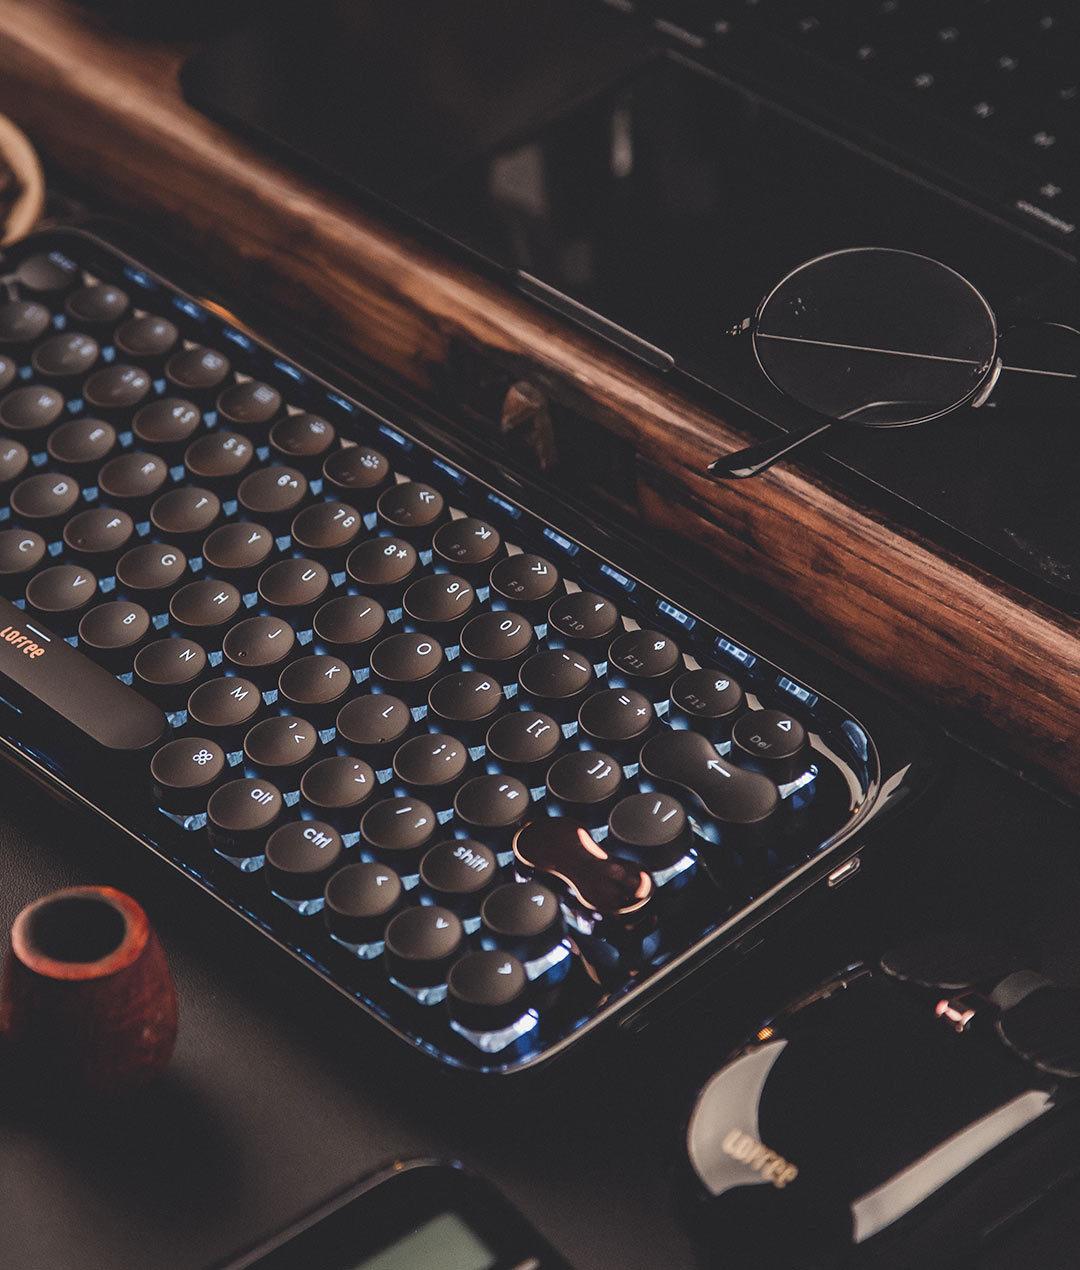 LOFREE 洛斐 新年款 墨金套装 键鼠套装+Poison 音箱+拾光灯+Digit计算器